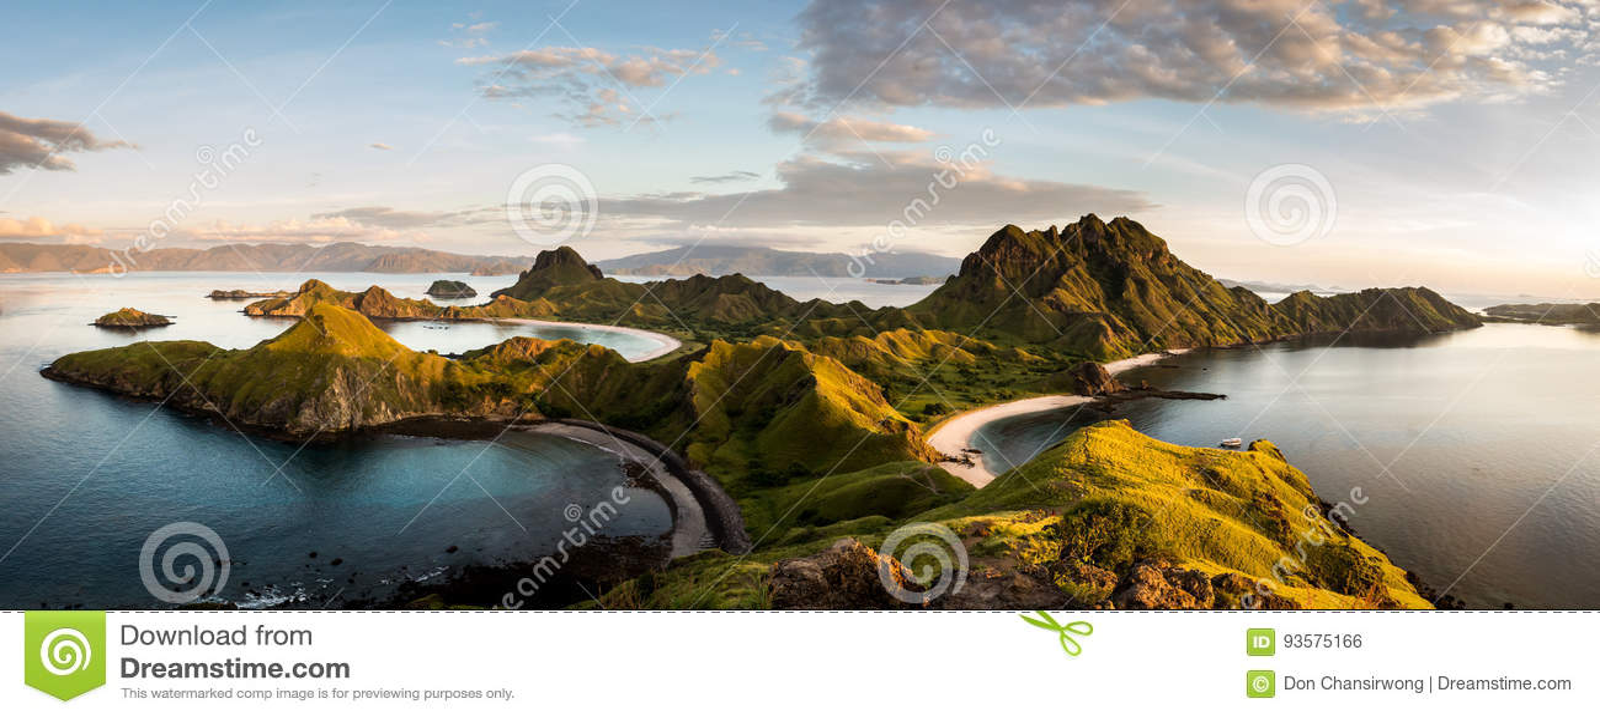 Landschapsmening vanaf de bovenkant van Padar-eiland in Komodo-eilanden, F